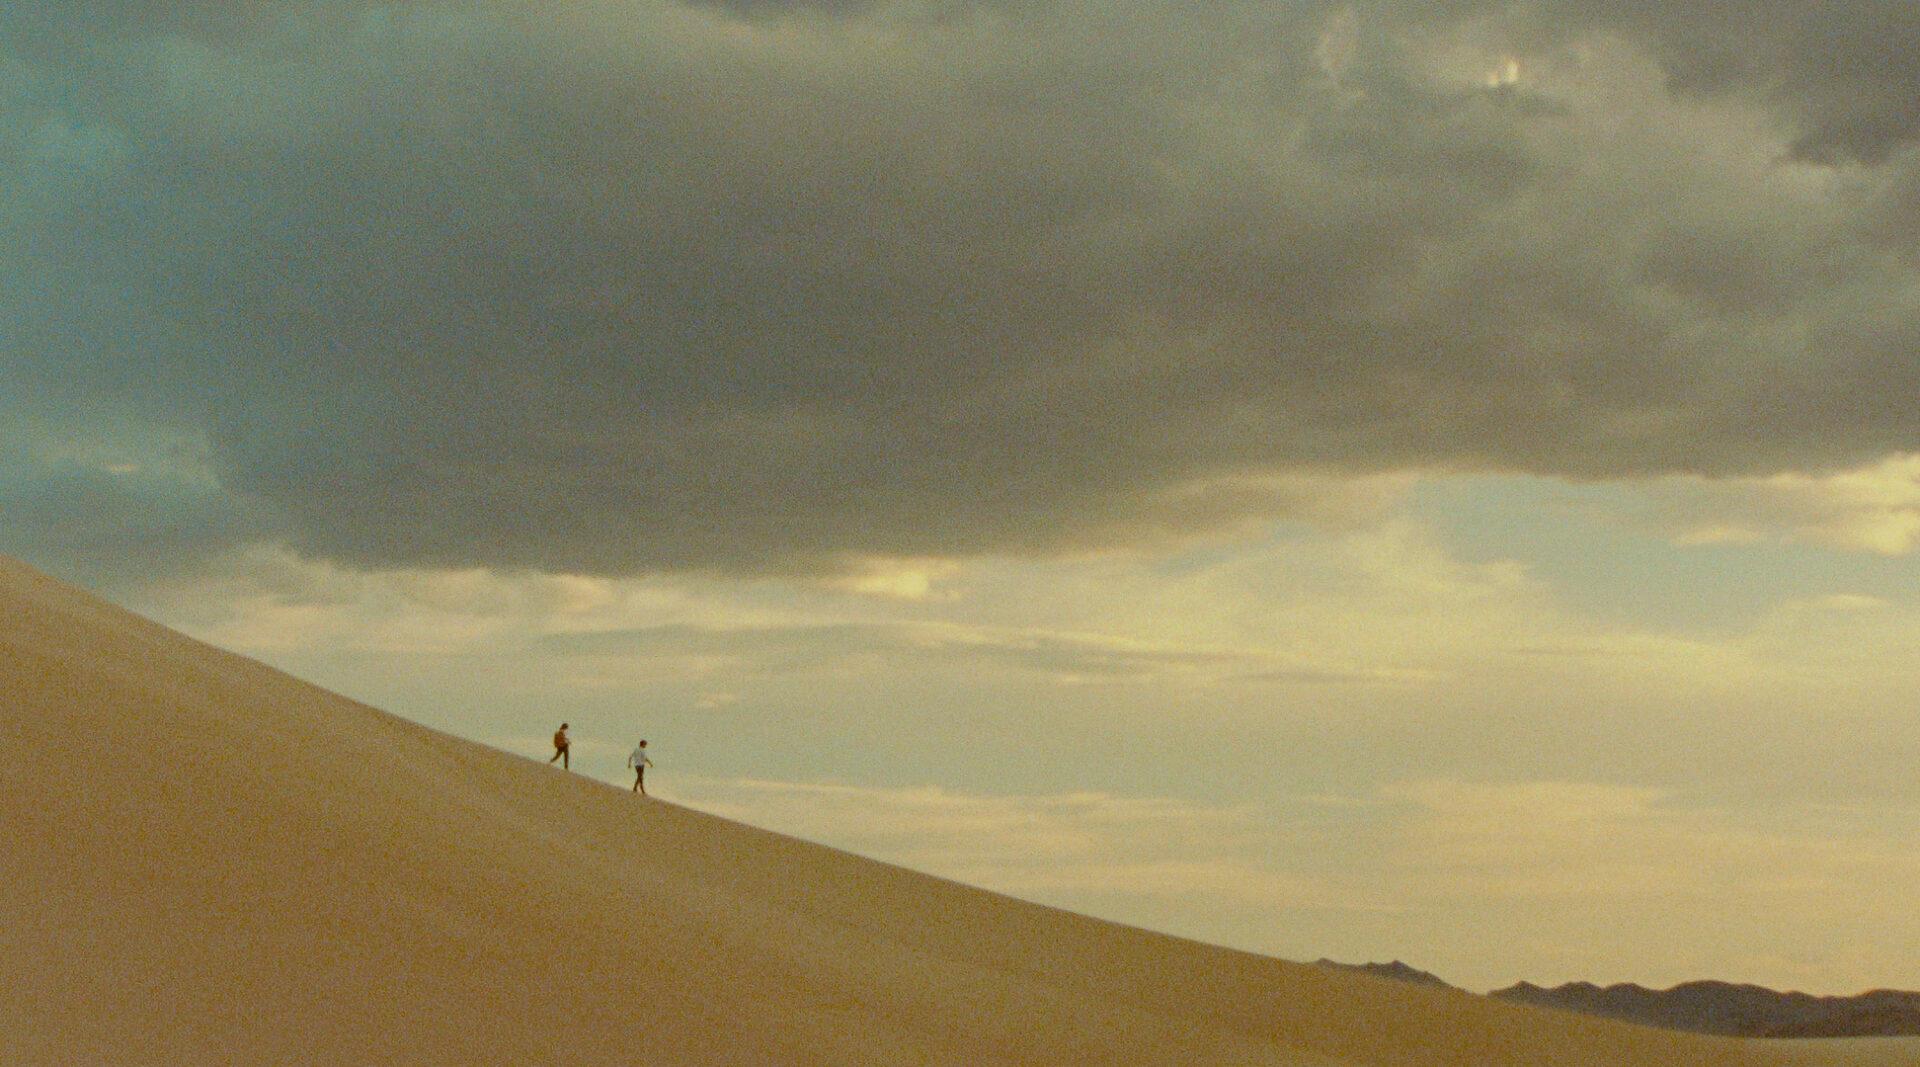 deserts_01-5